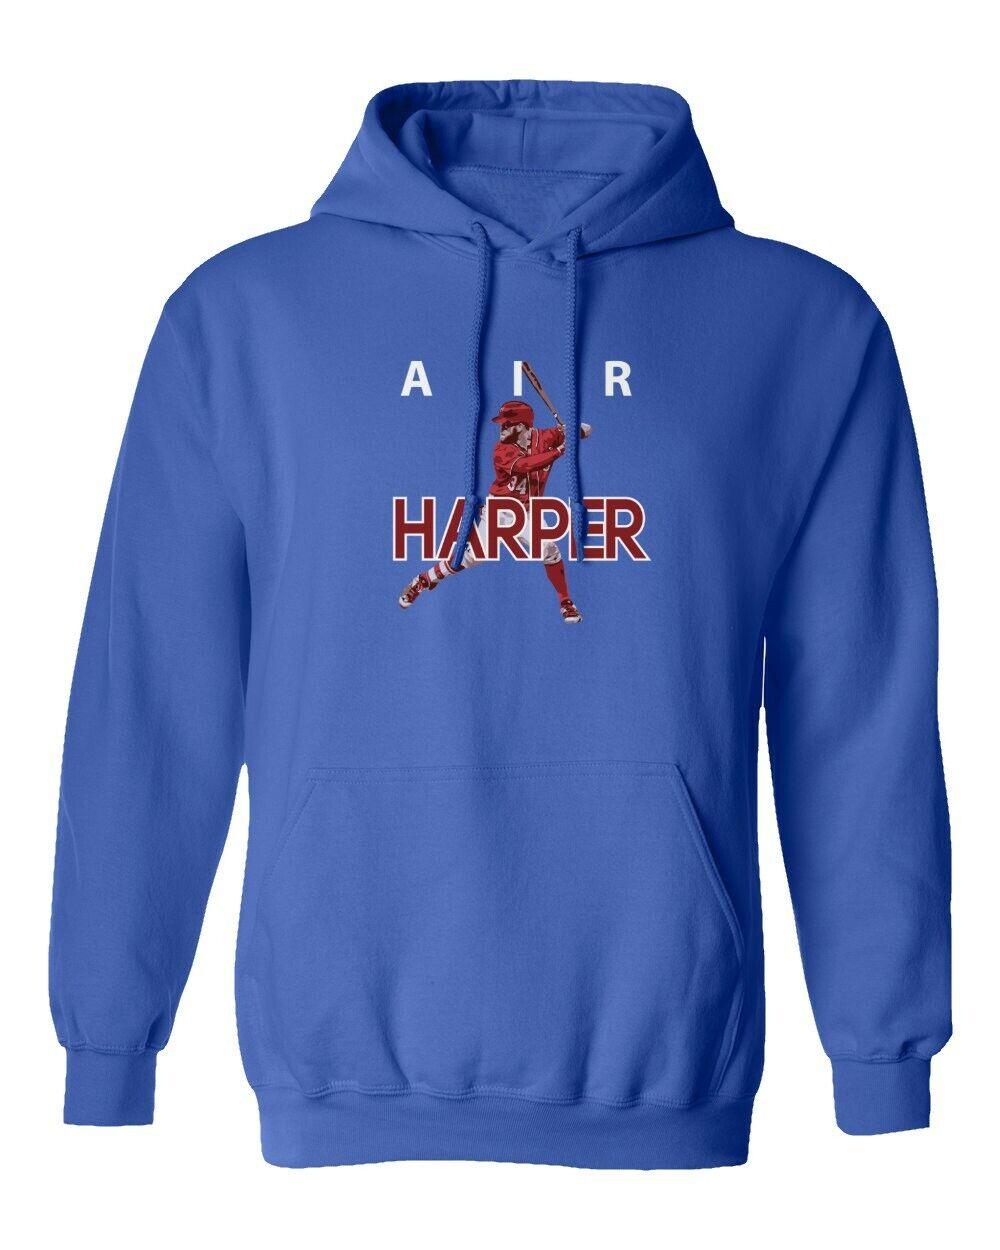 Philadelphia Fans Bryce Harper Phillies Philly Air Pic Hooded Sweatshirt